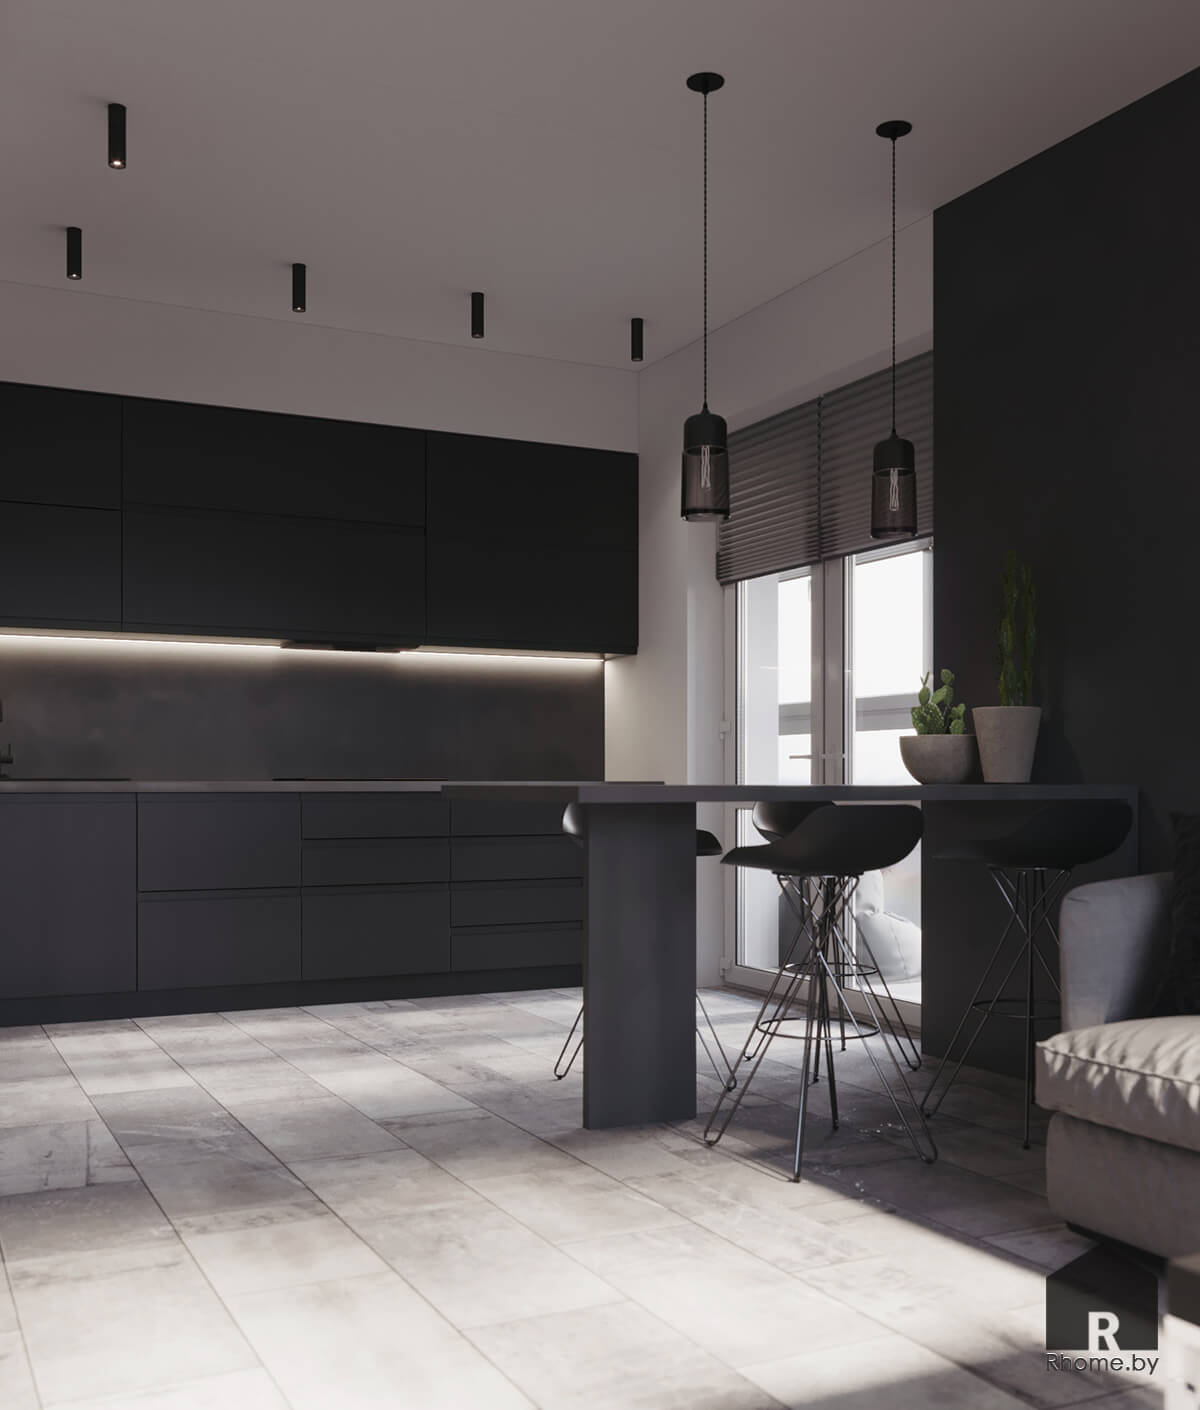 Кухня-гостиная | Дизайн студия – Rhome.by